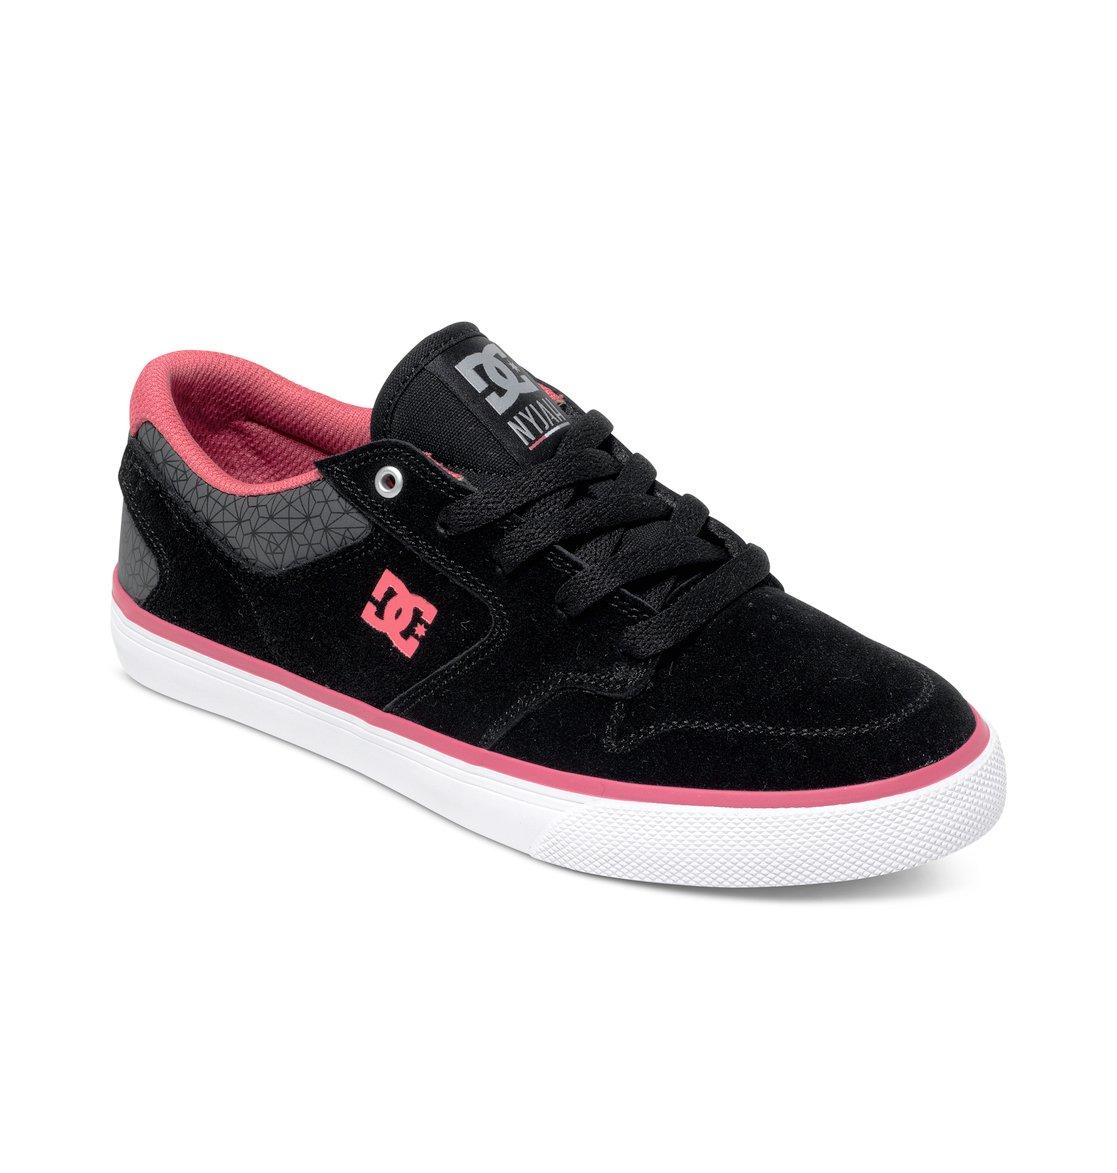 Купить Обувь для скейтборда   Nyjah Vulc SE